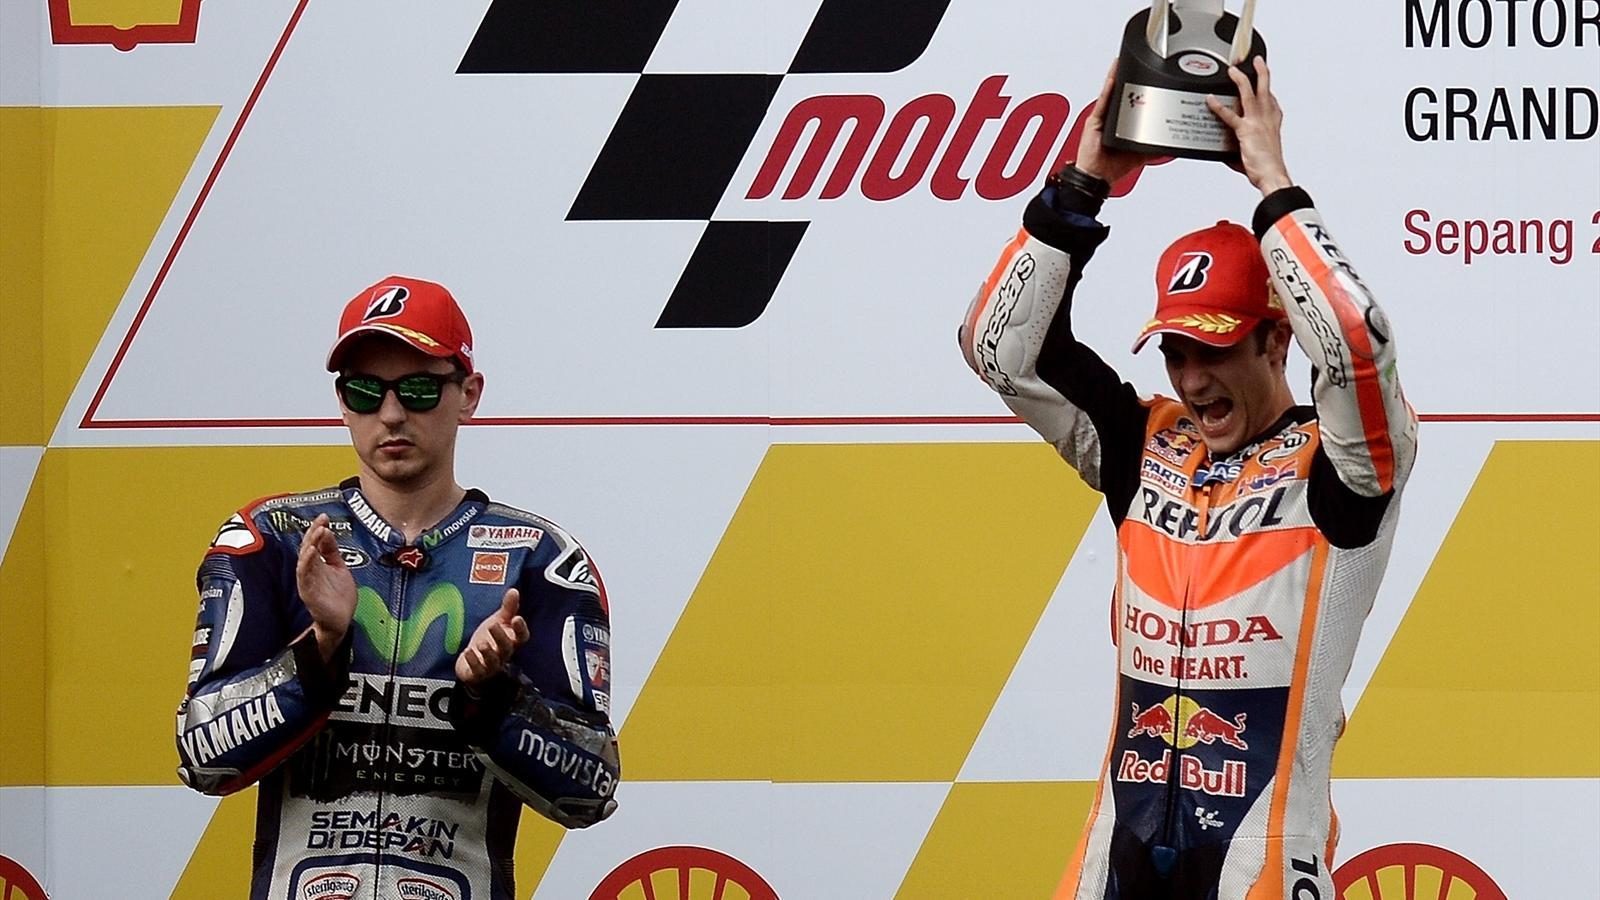 Jorge Lorenzo claps as Dani Pedrosa celebrates on the podium in Malaysia